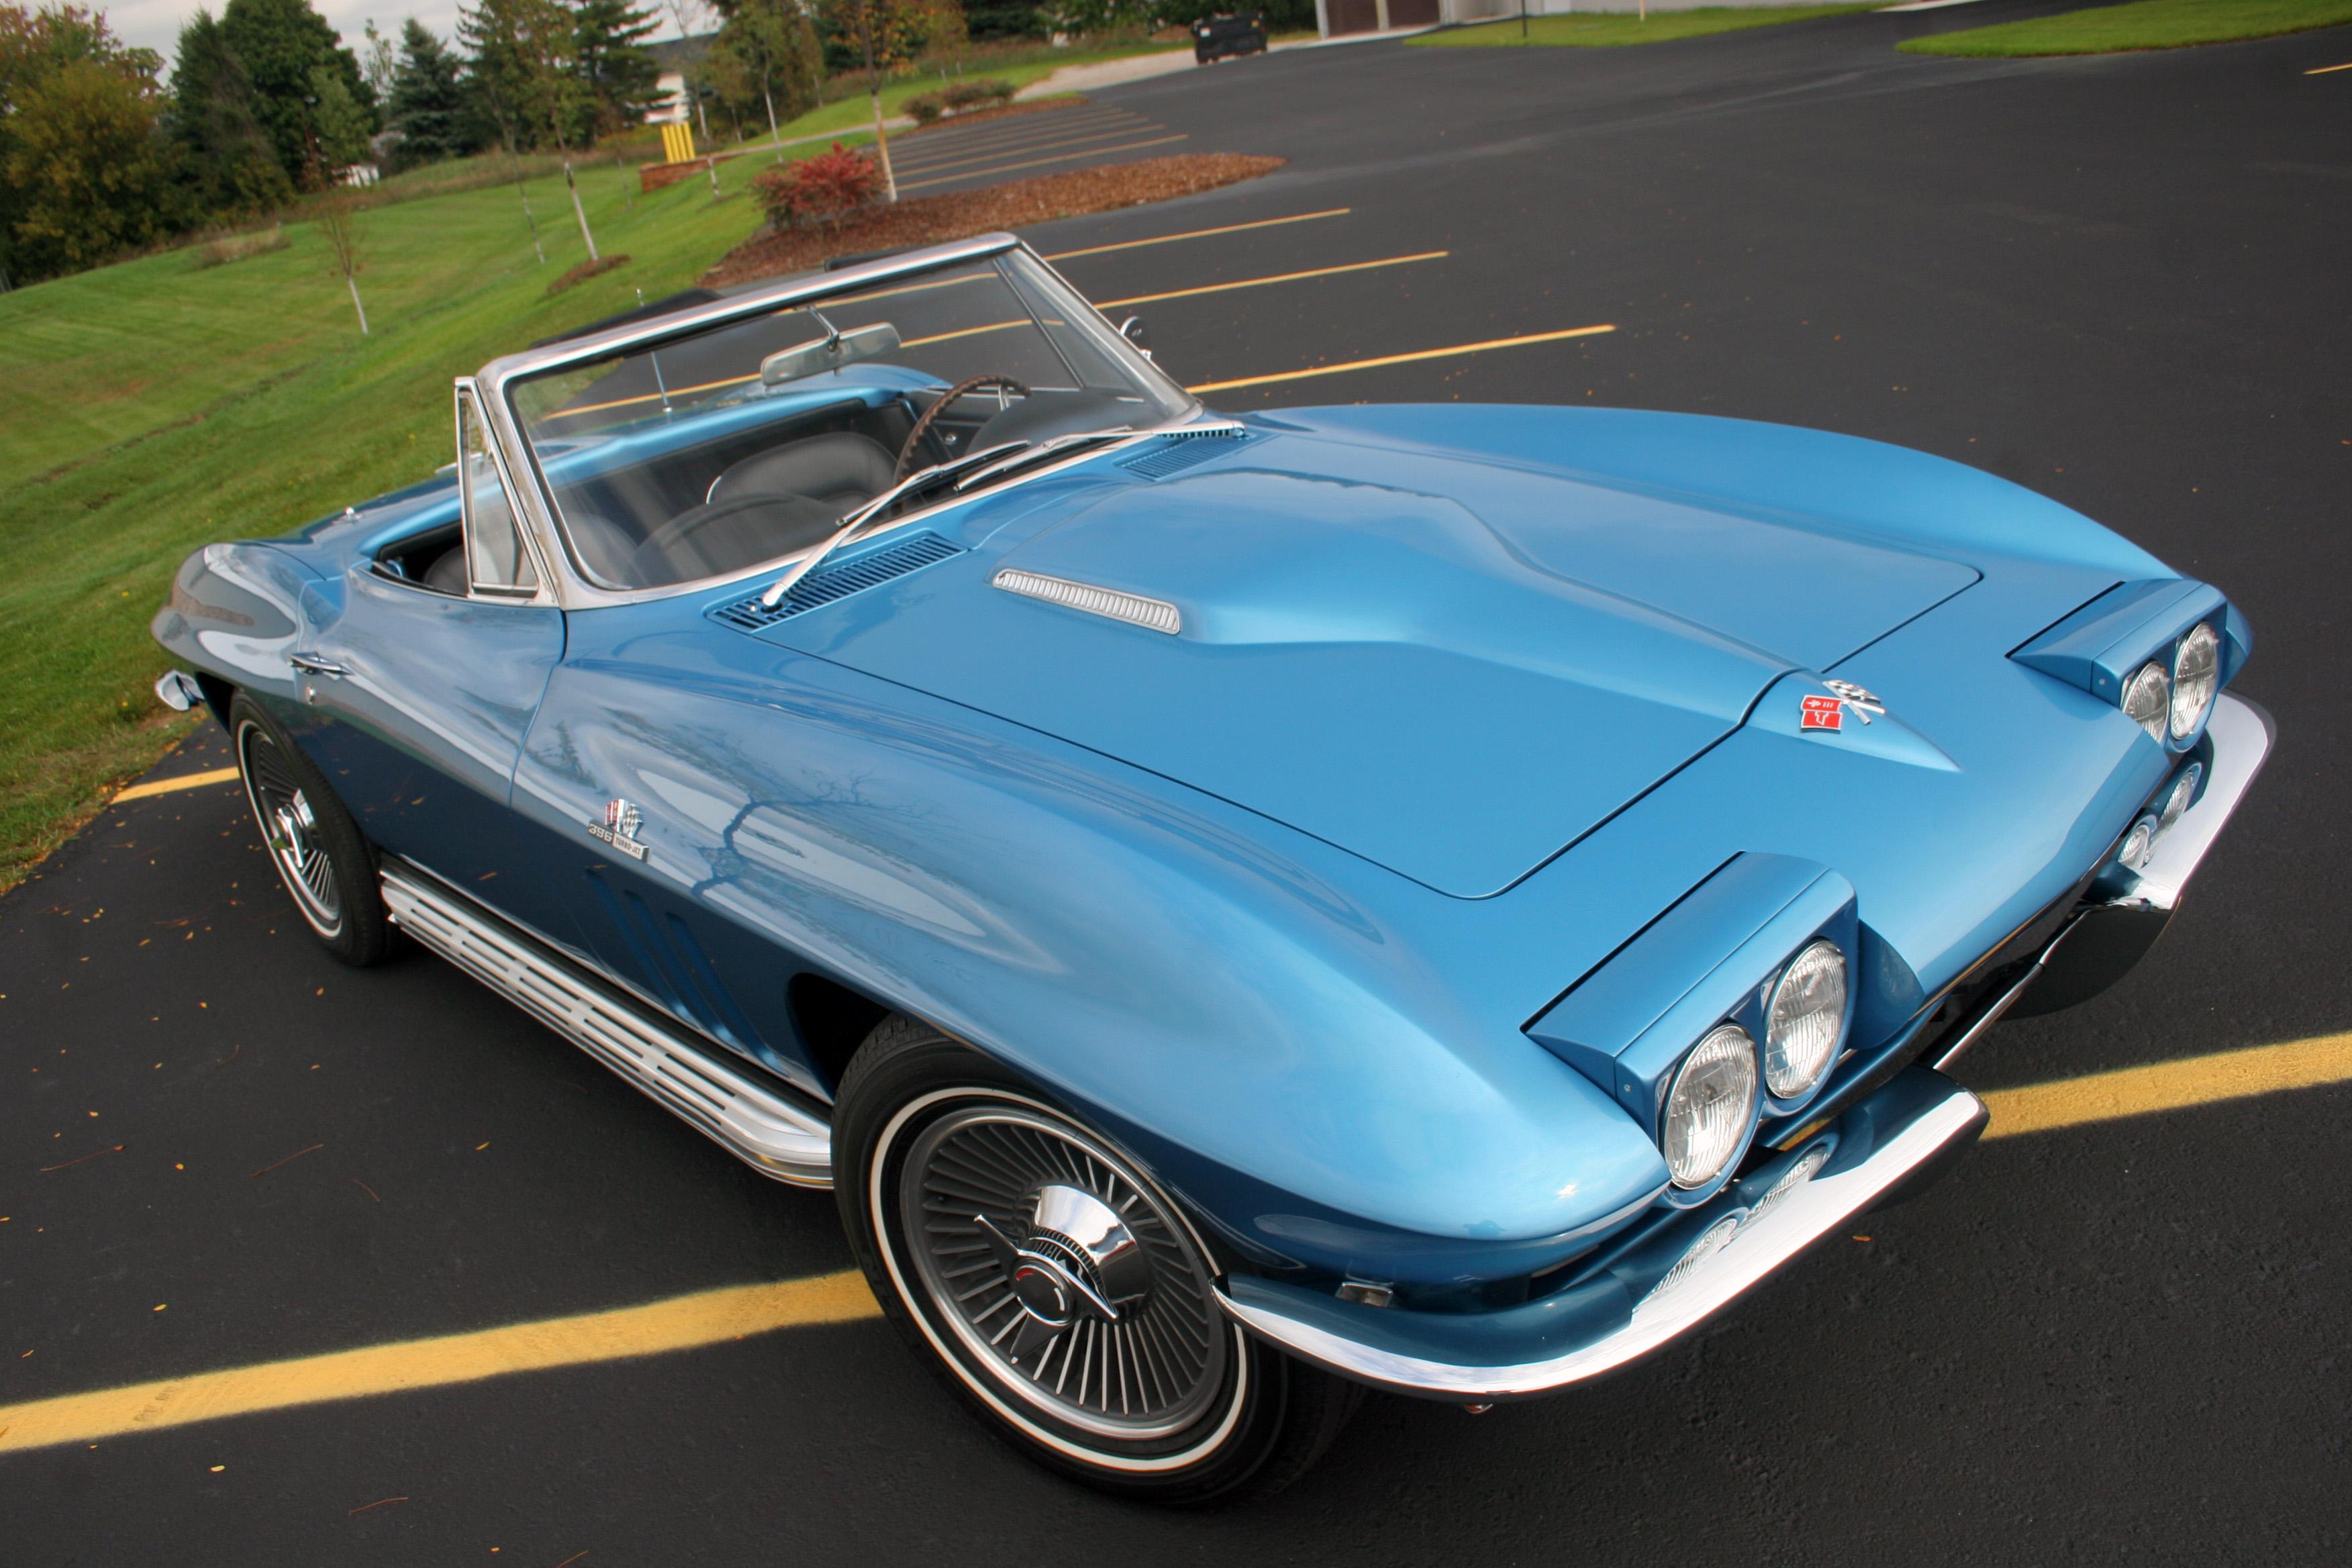 1965 corvette wallpaper - photo #15